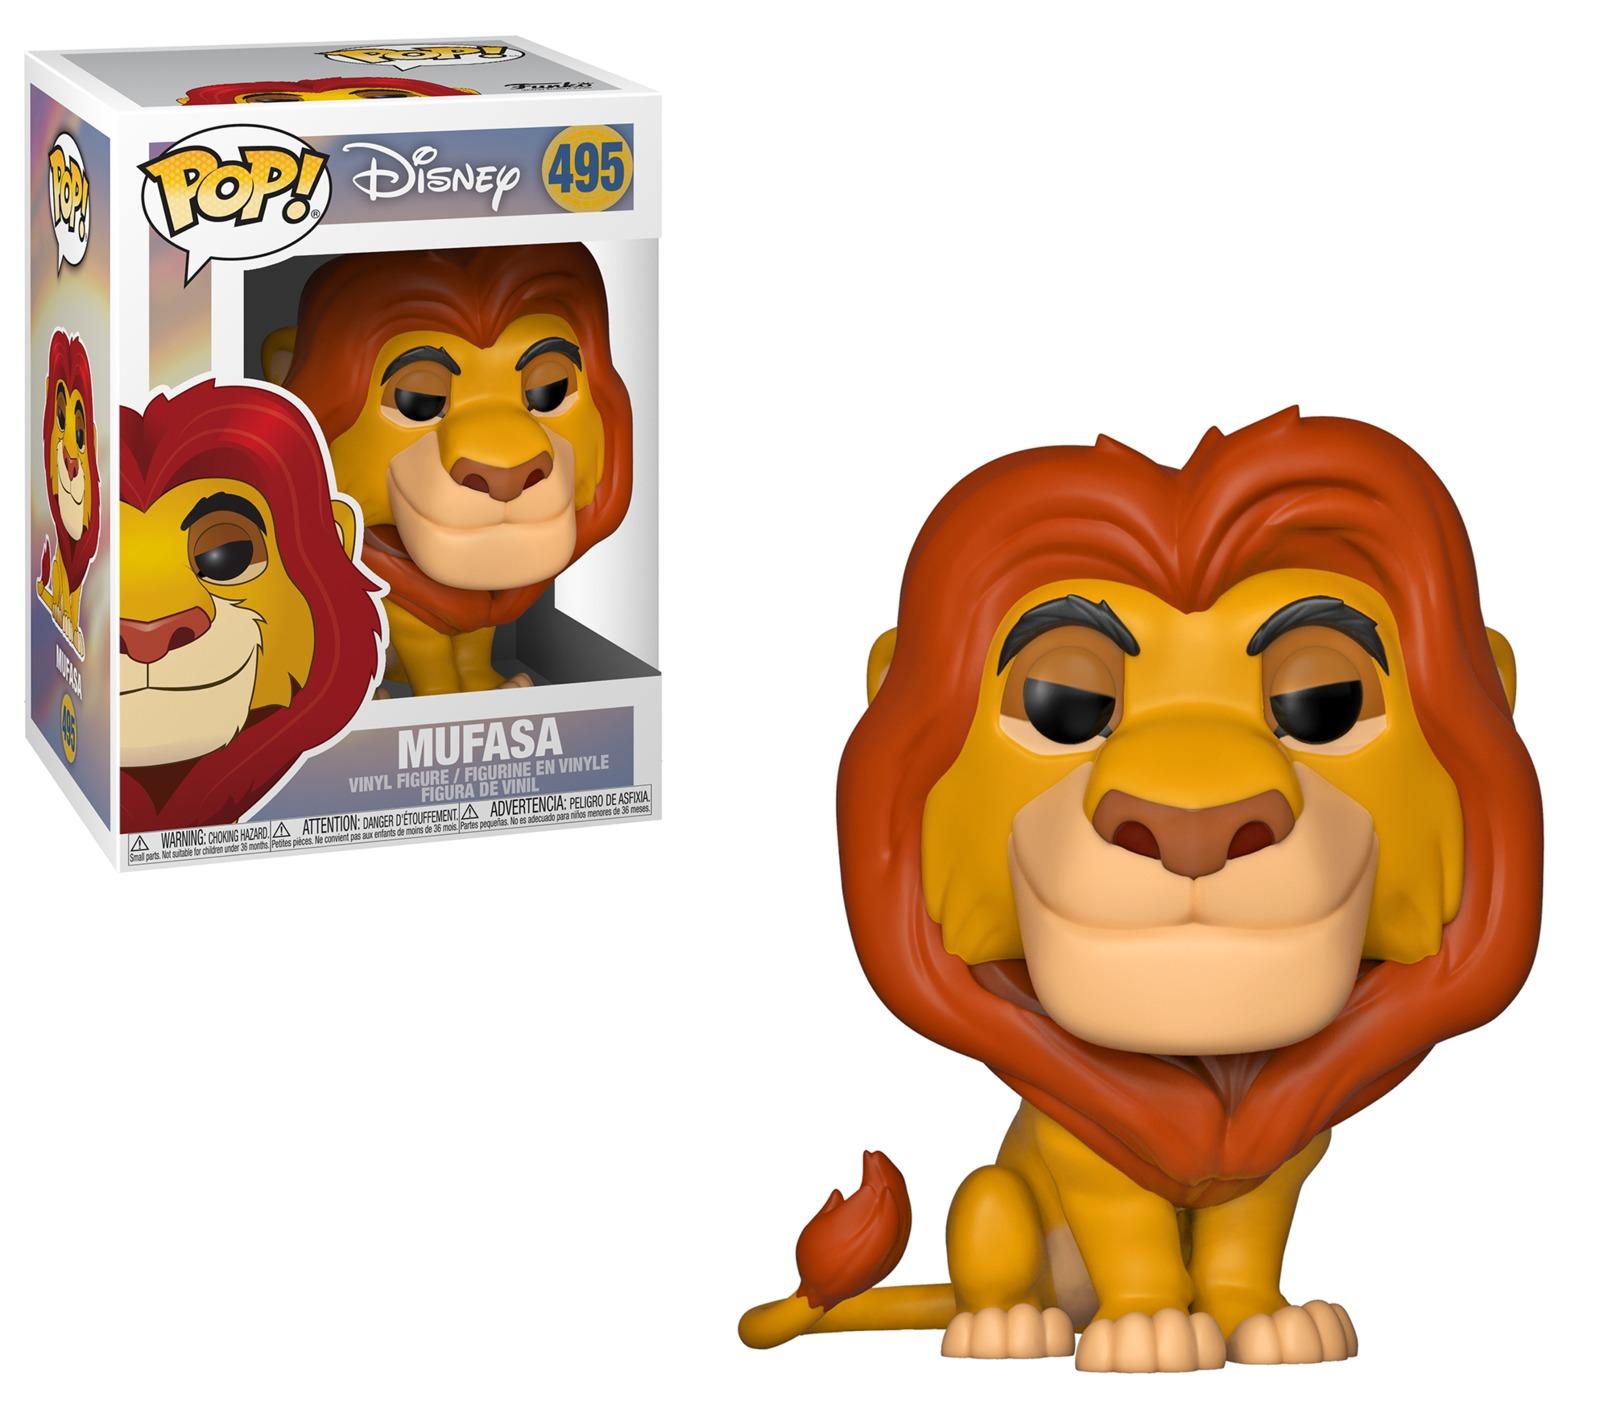 The Lion King: Mufasa - Pop! Vinyl Figure image